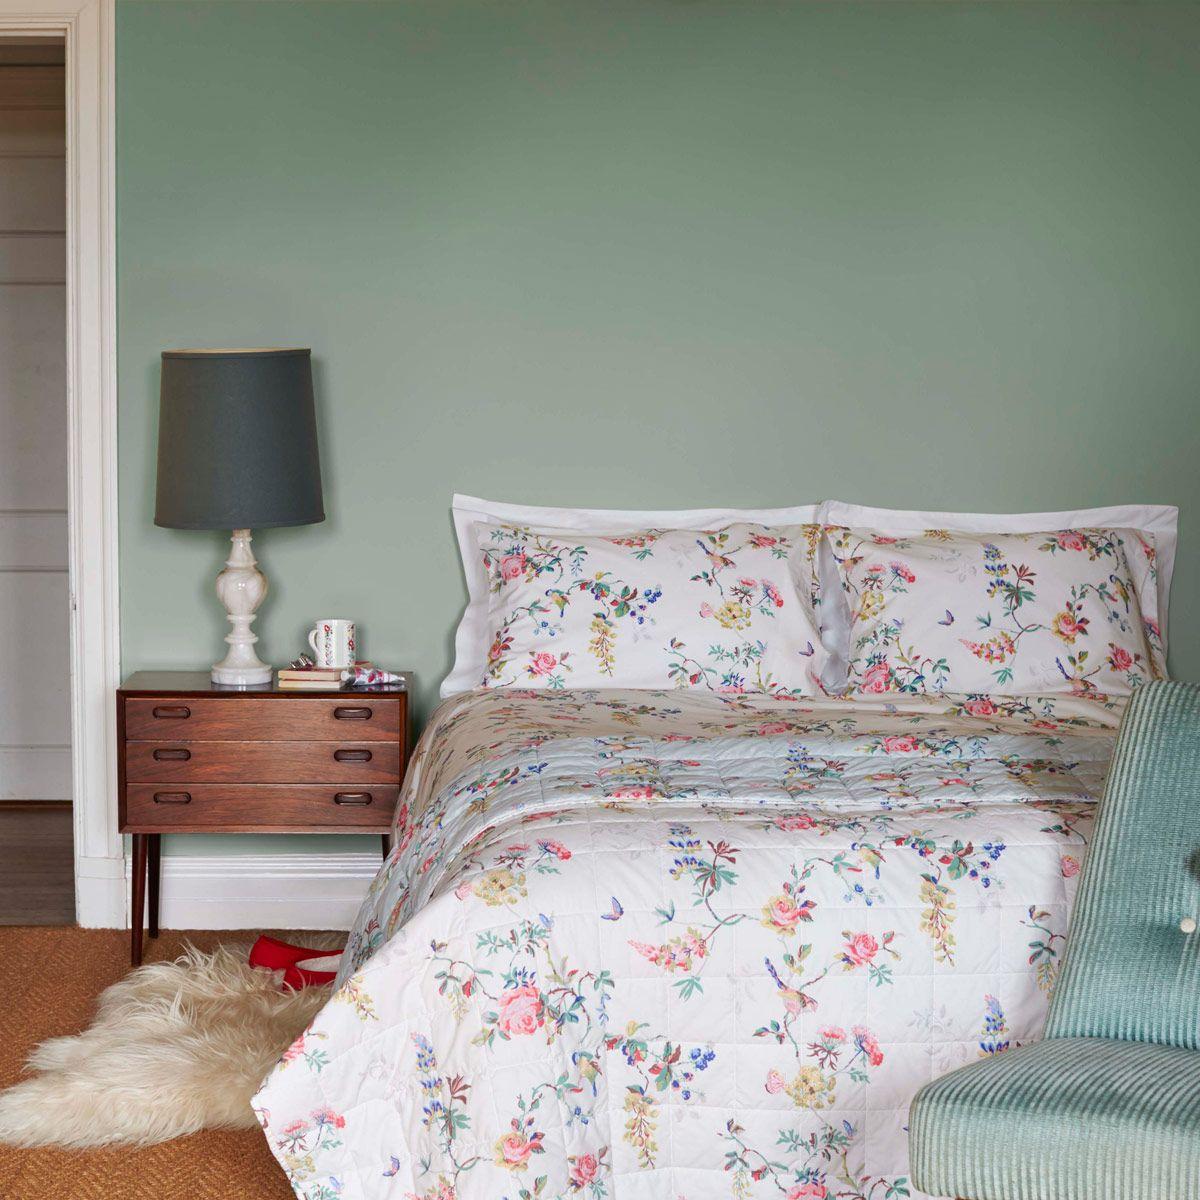 birds roses bed linen cath kidston for your home bedroom rh pinterest com